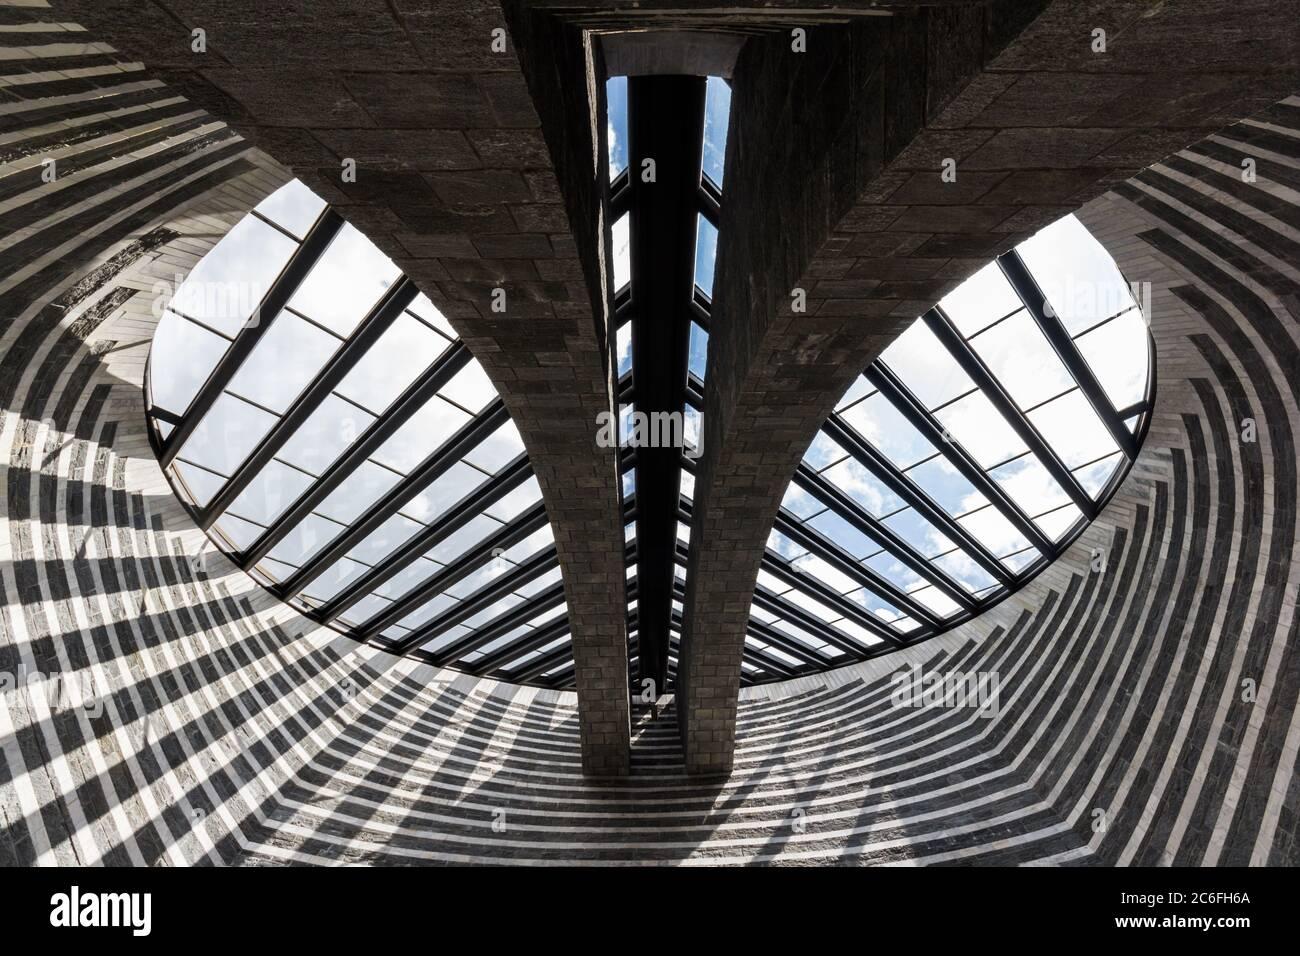 Mogno, Suiza - 01 de junio de 2018: La Iglesia de San Giovanni Battista por el famoso arquitecto Mario Botta, construido ii Maggia Valle (Val Lavizzara) a Foto de stock